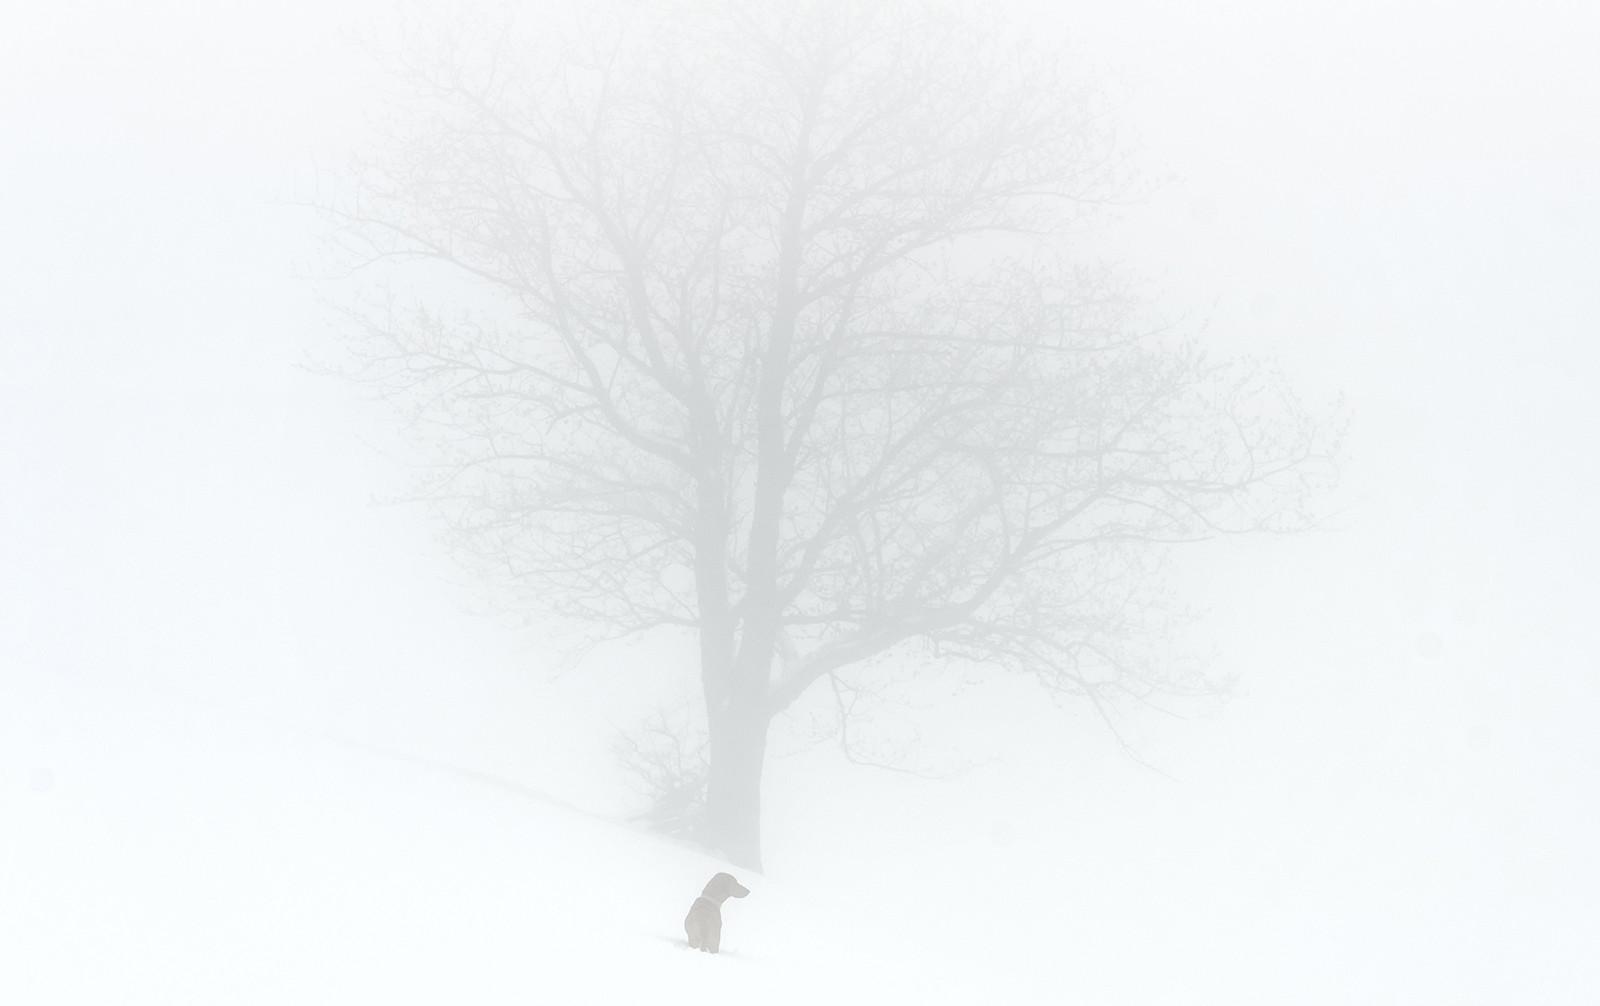 Baš magla